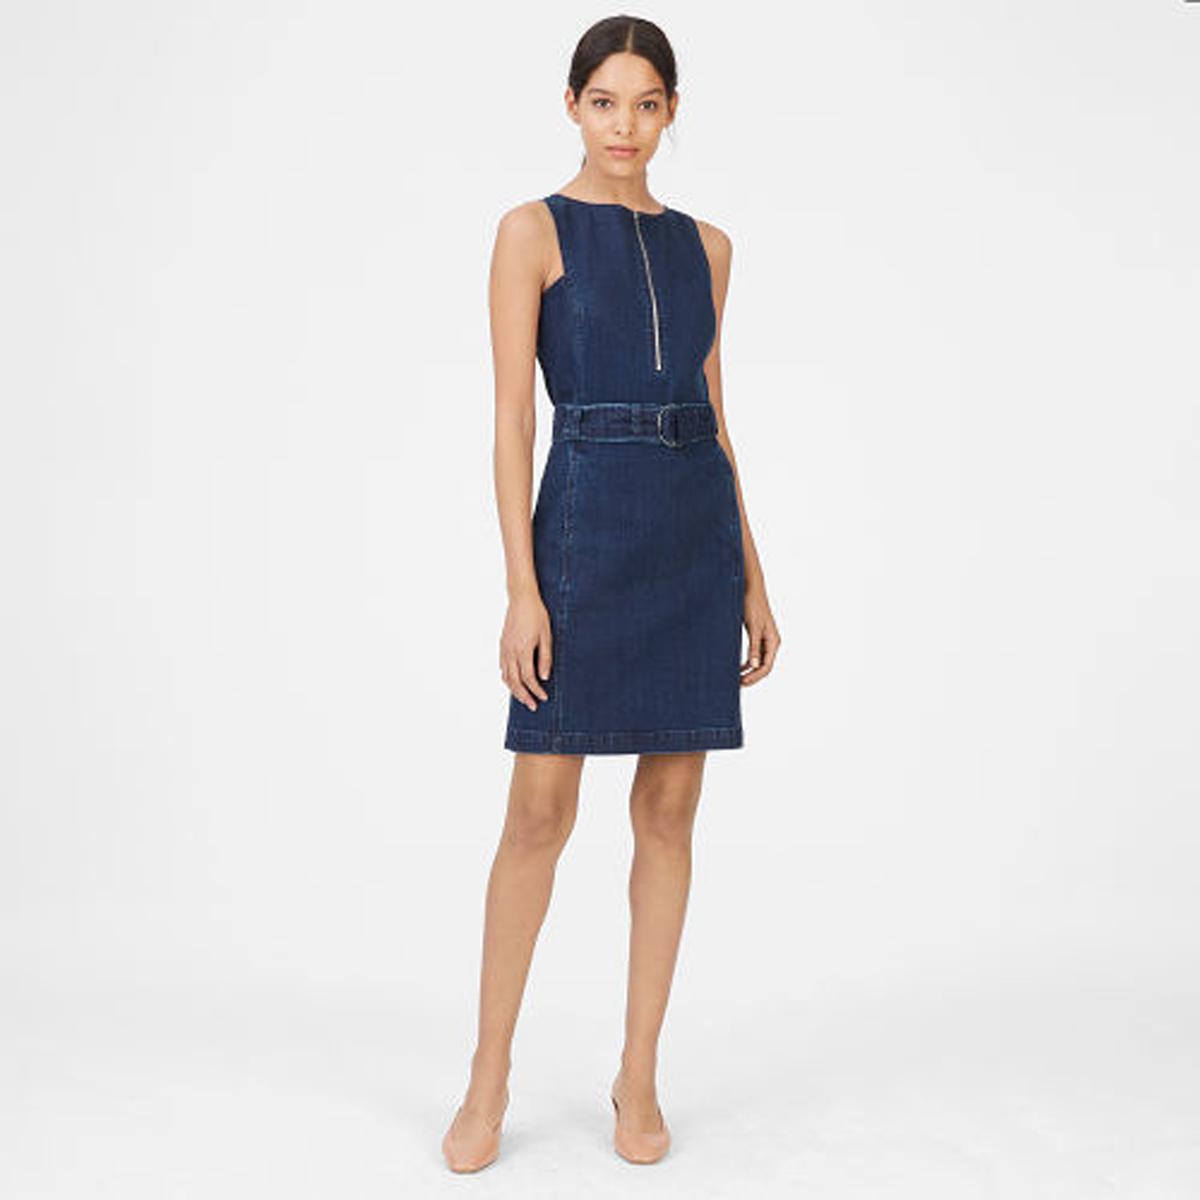 Lizel Denim Dress   HK$2,090